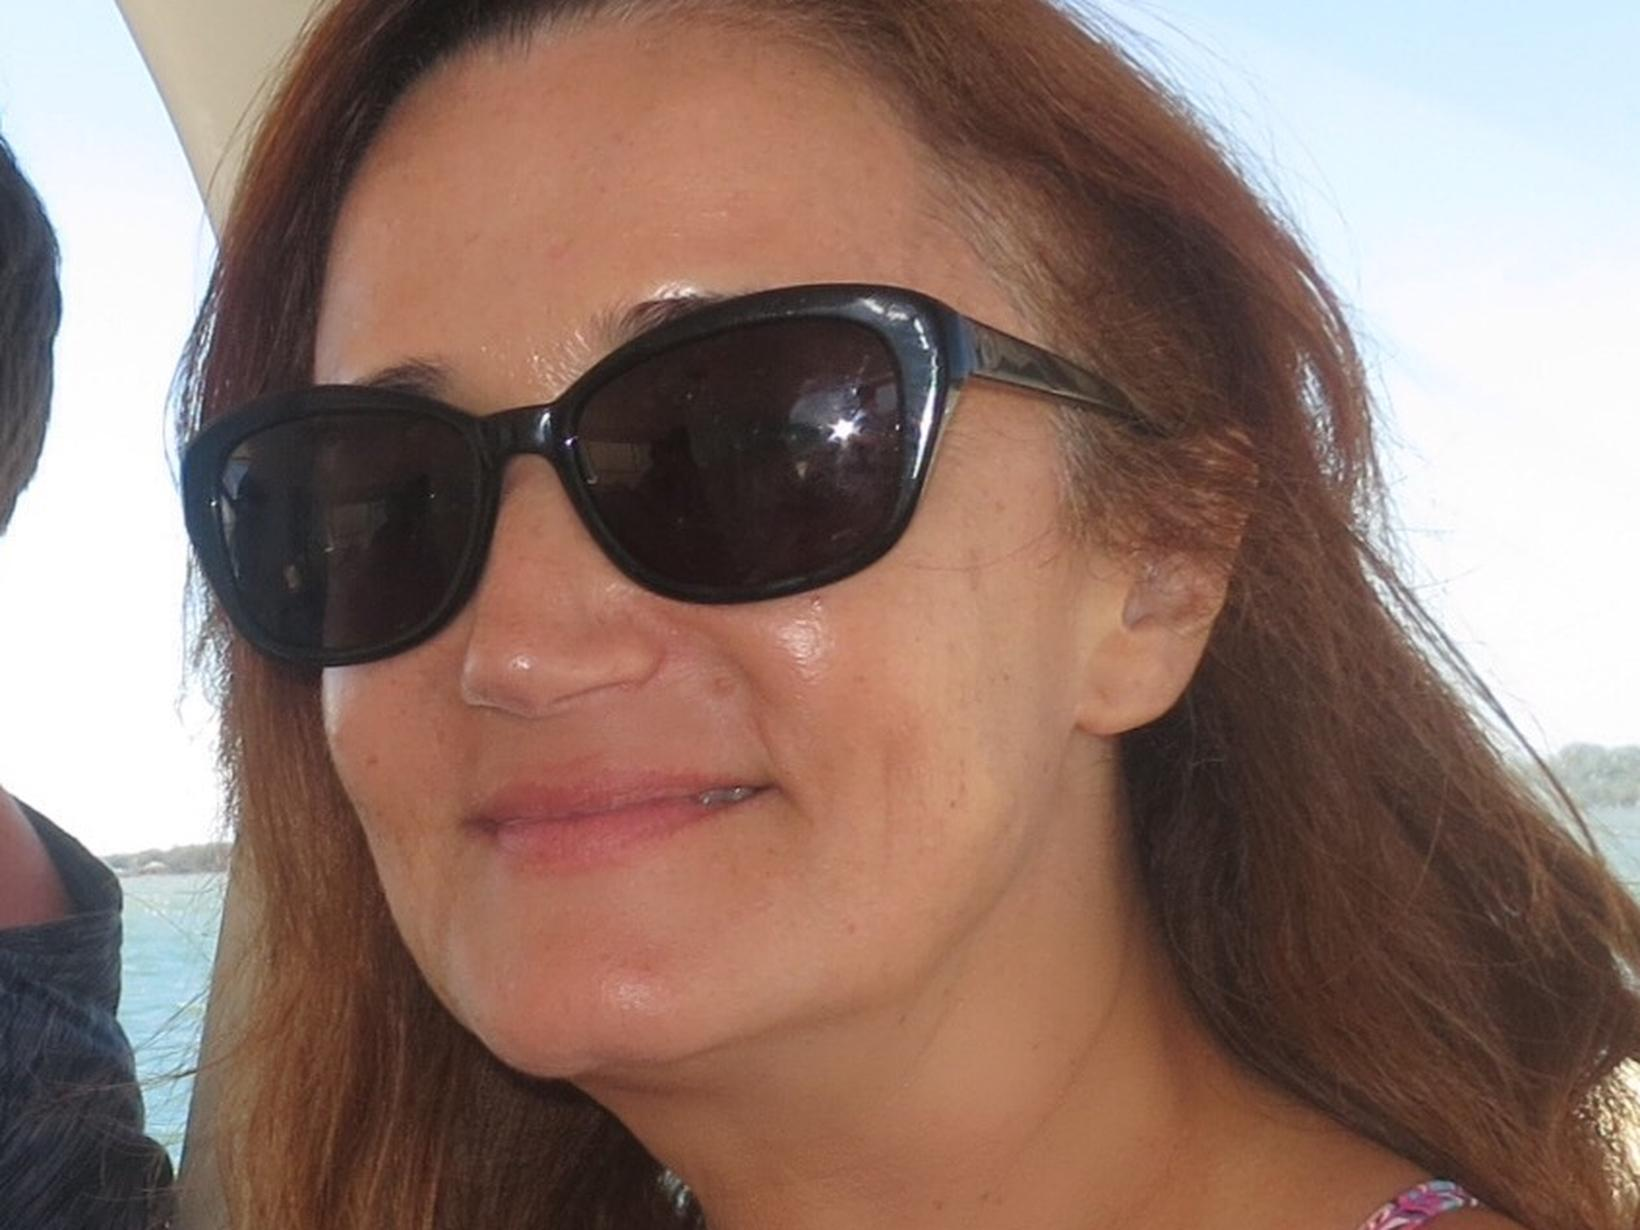 Nadia from Brisbane, Queensland, Australia